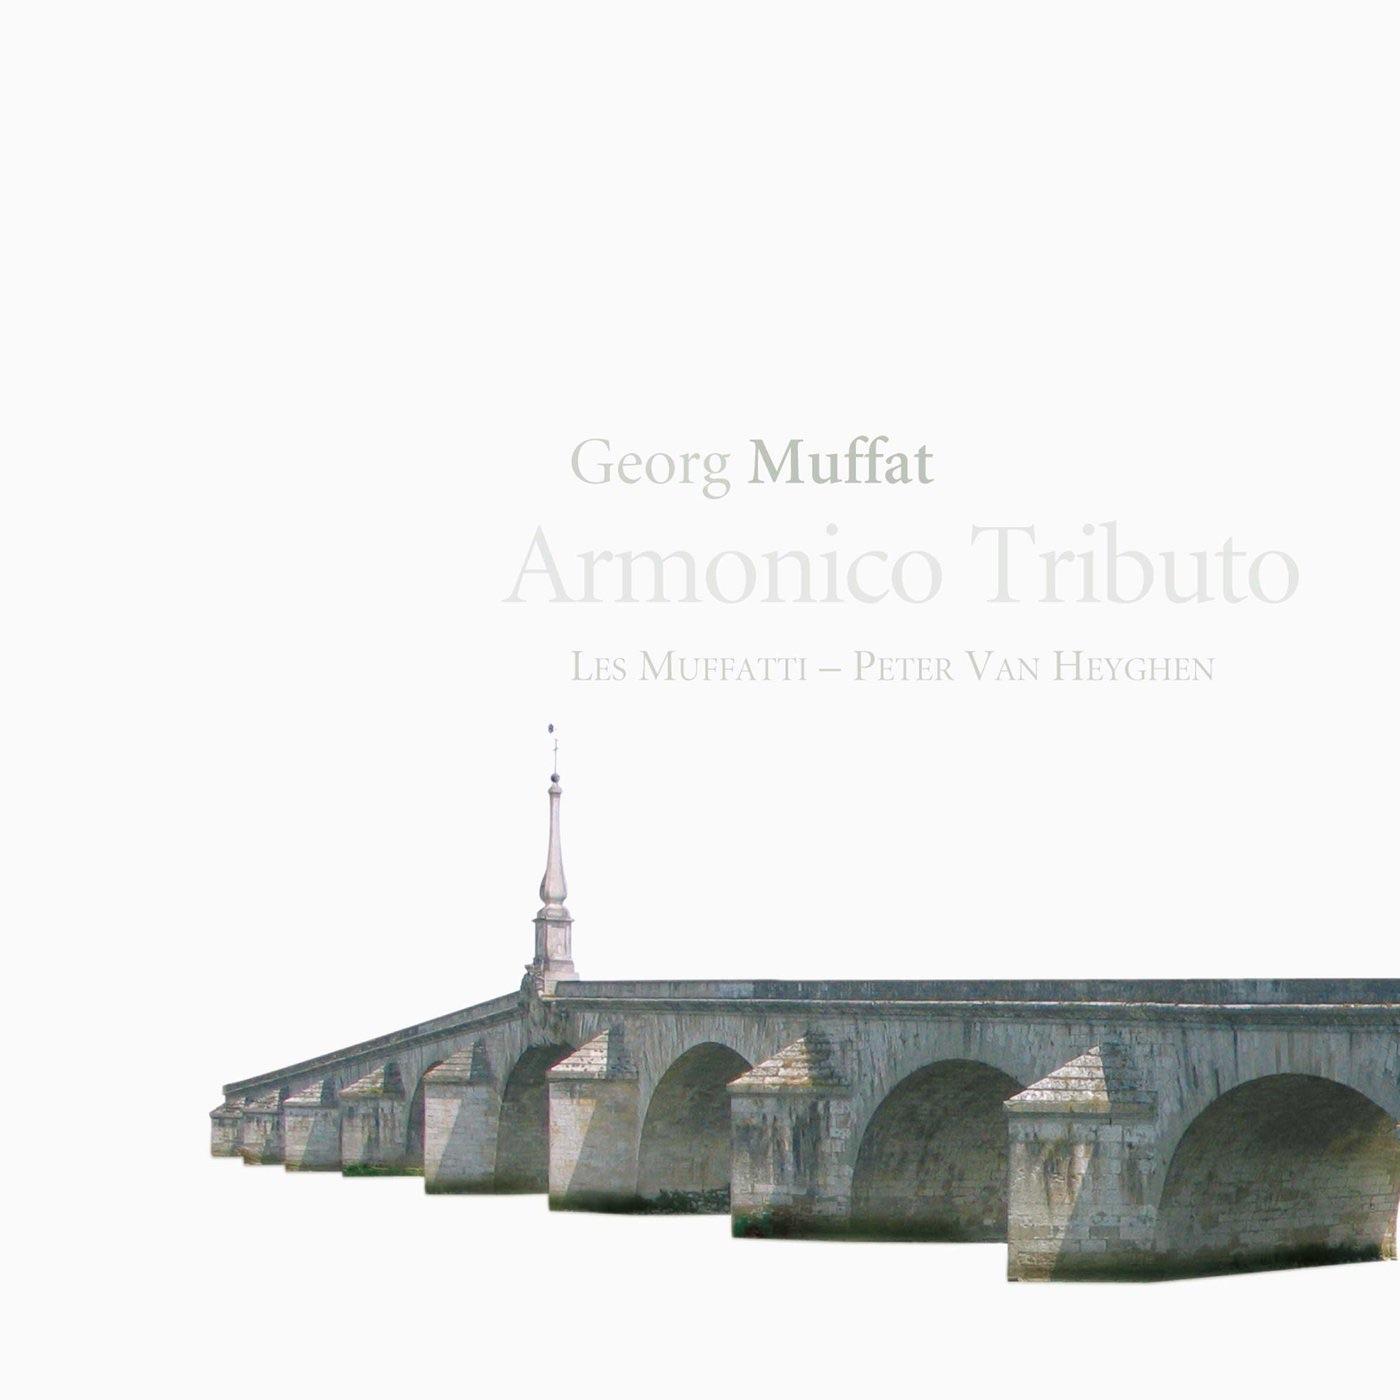 Armonico tributo. Sonata for Strings and Basso Continuo No. 1 in D Major,